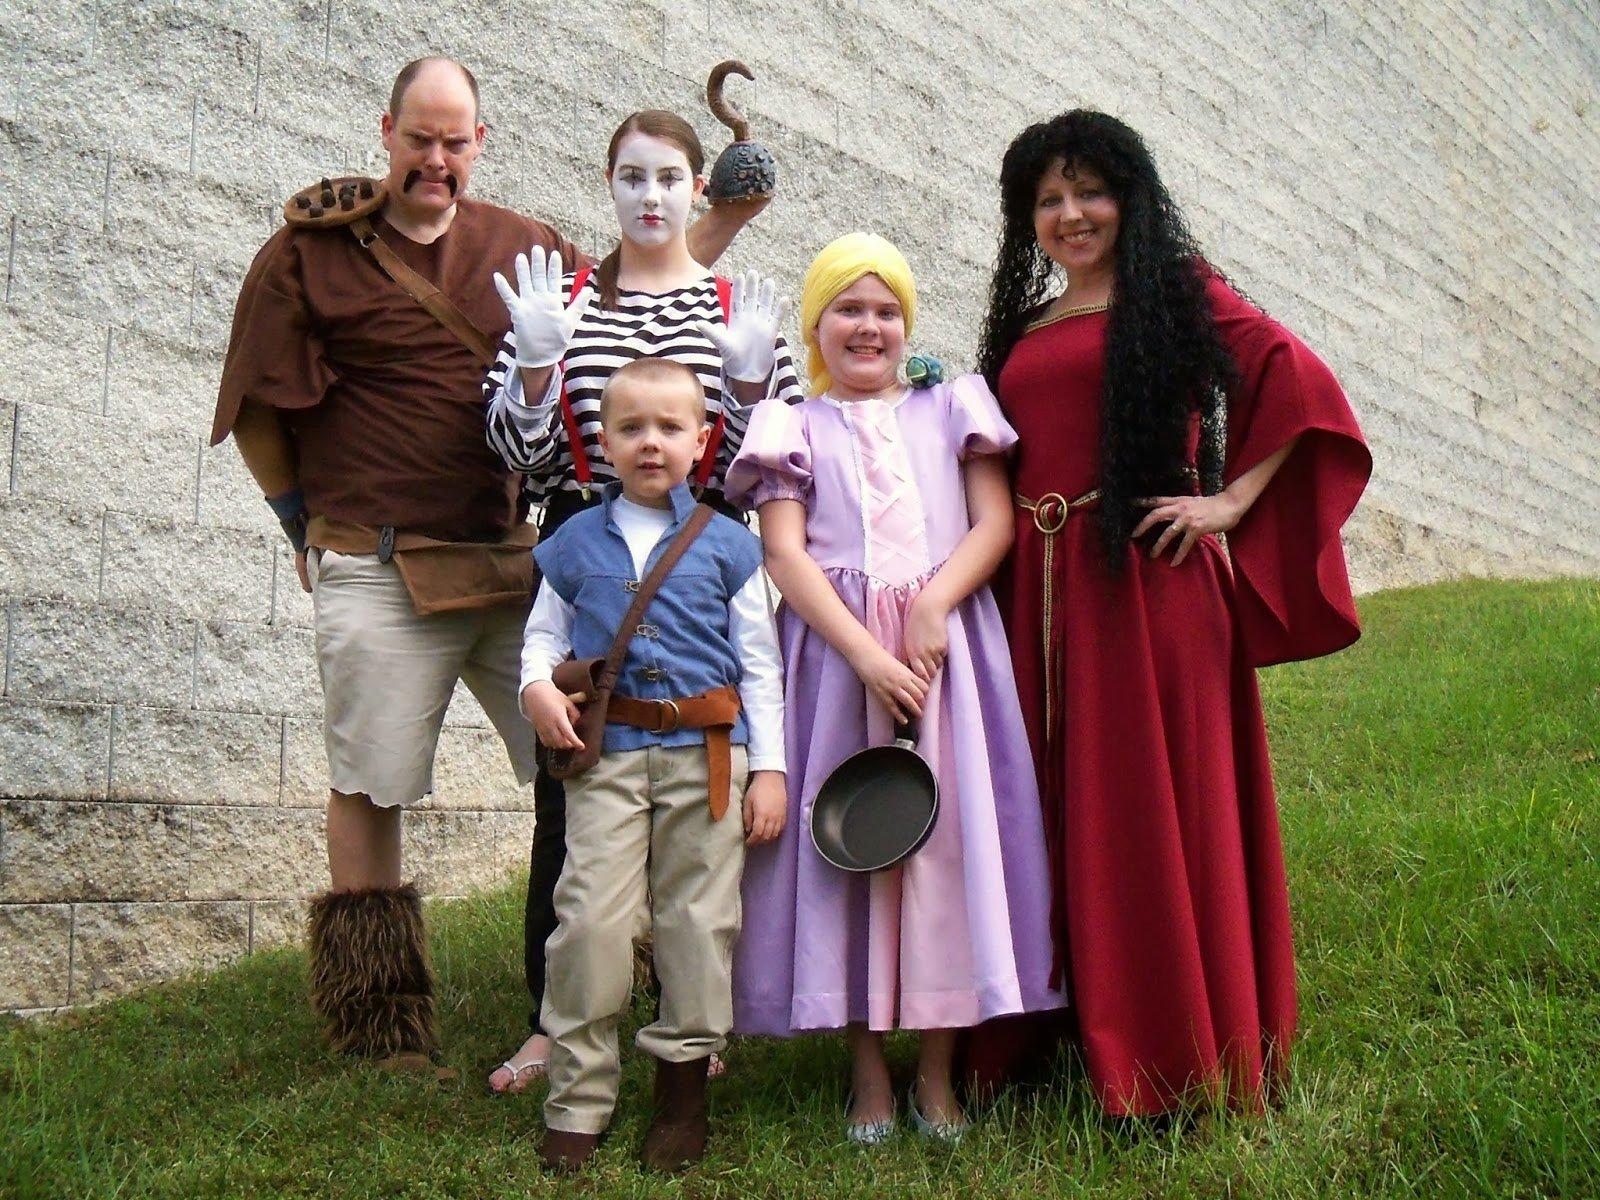 10 Fashionable Family Of Four Halloween Costume Ideas bird on a cake 2013 2020